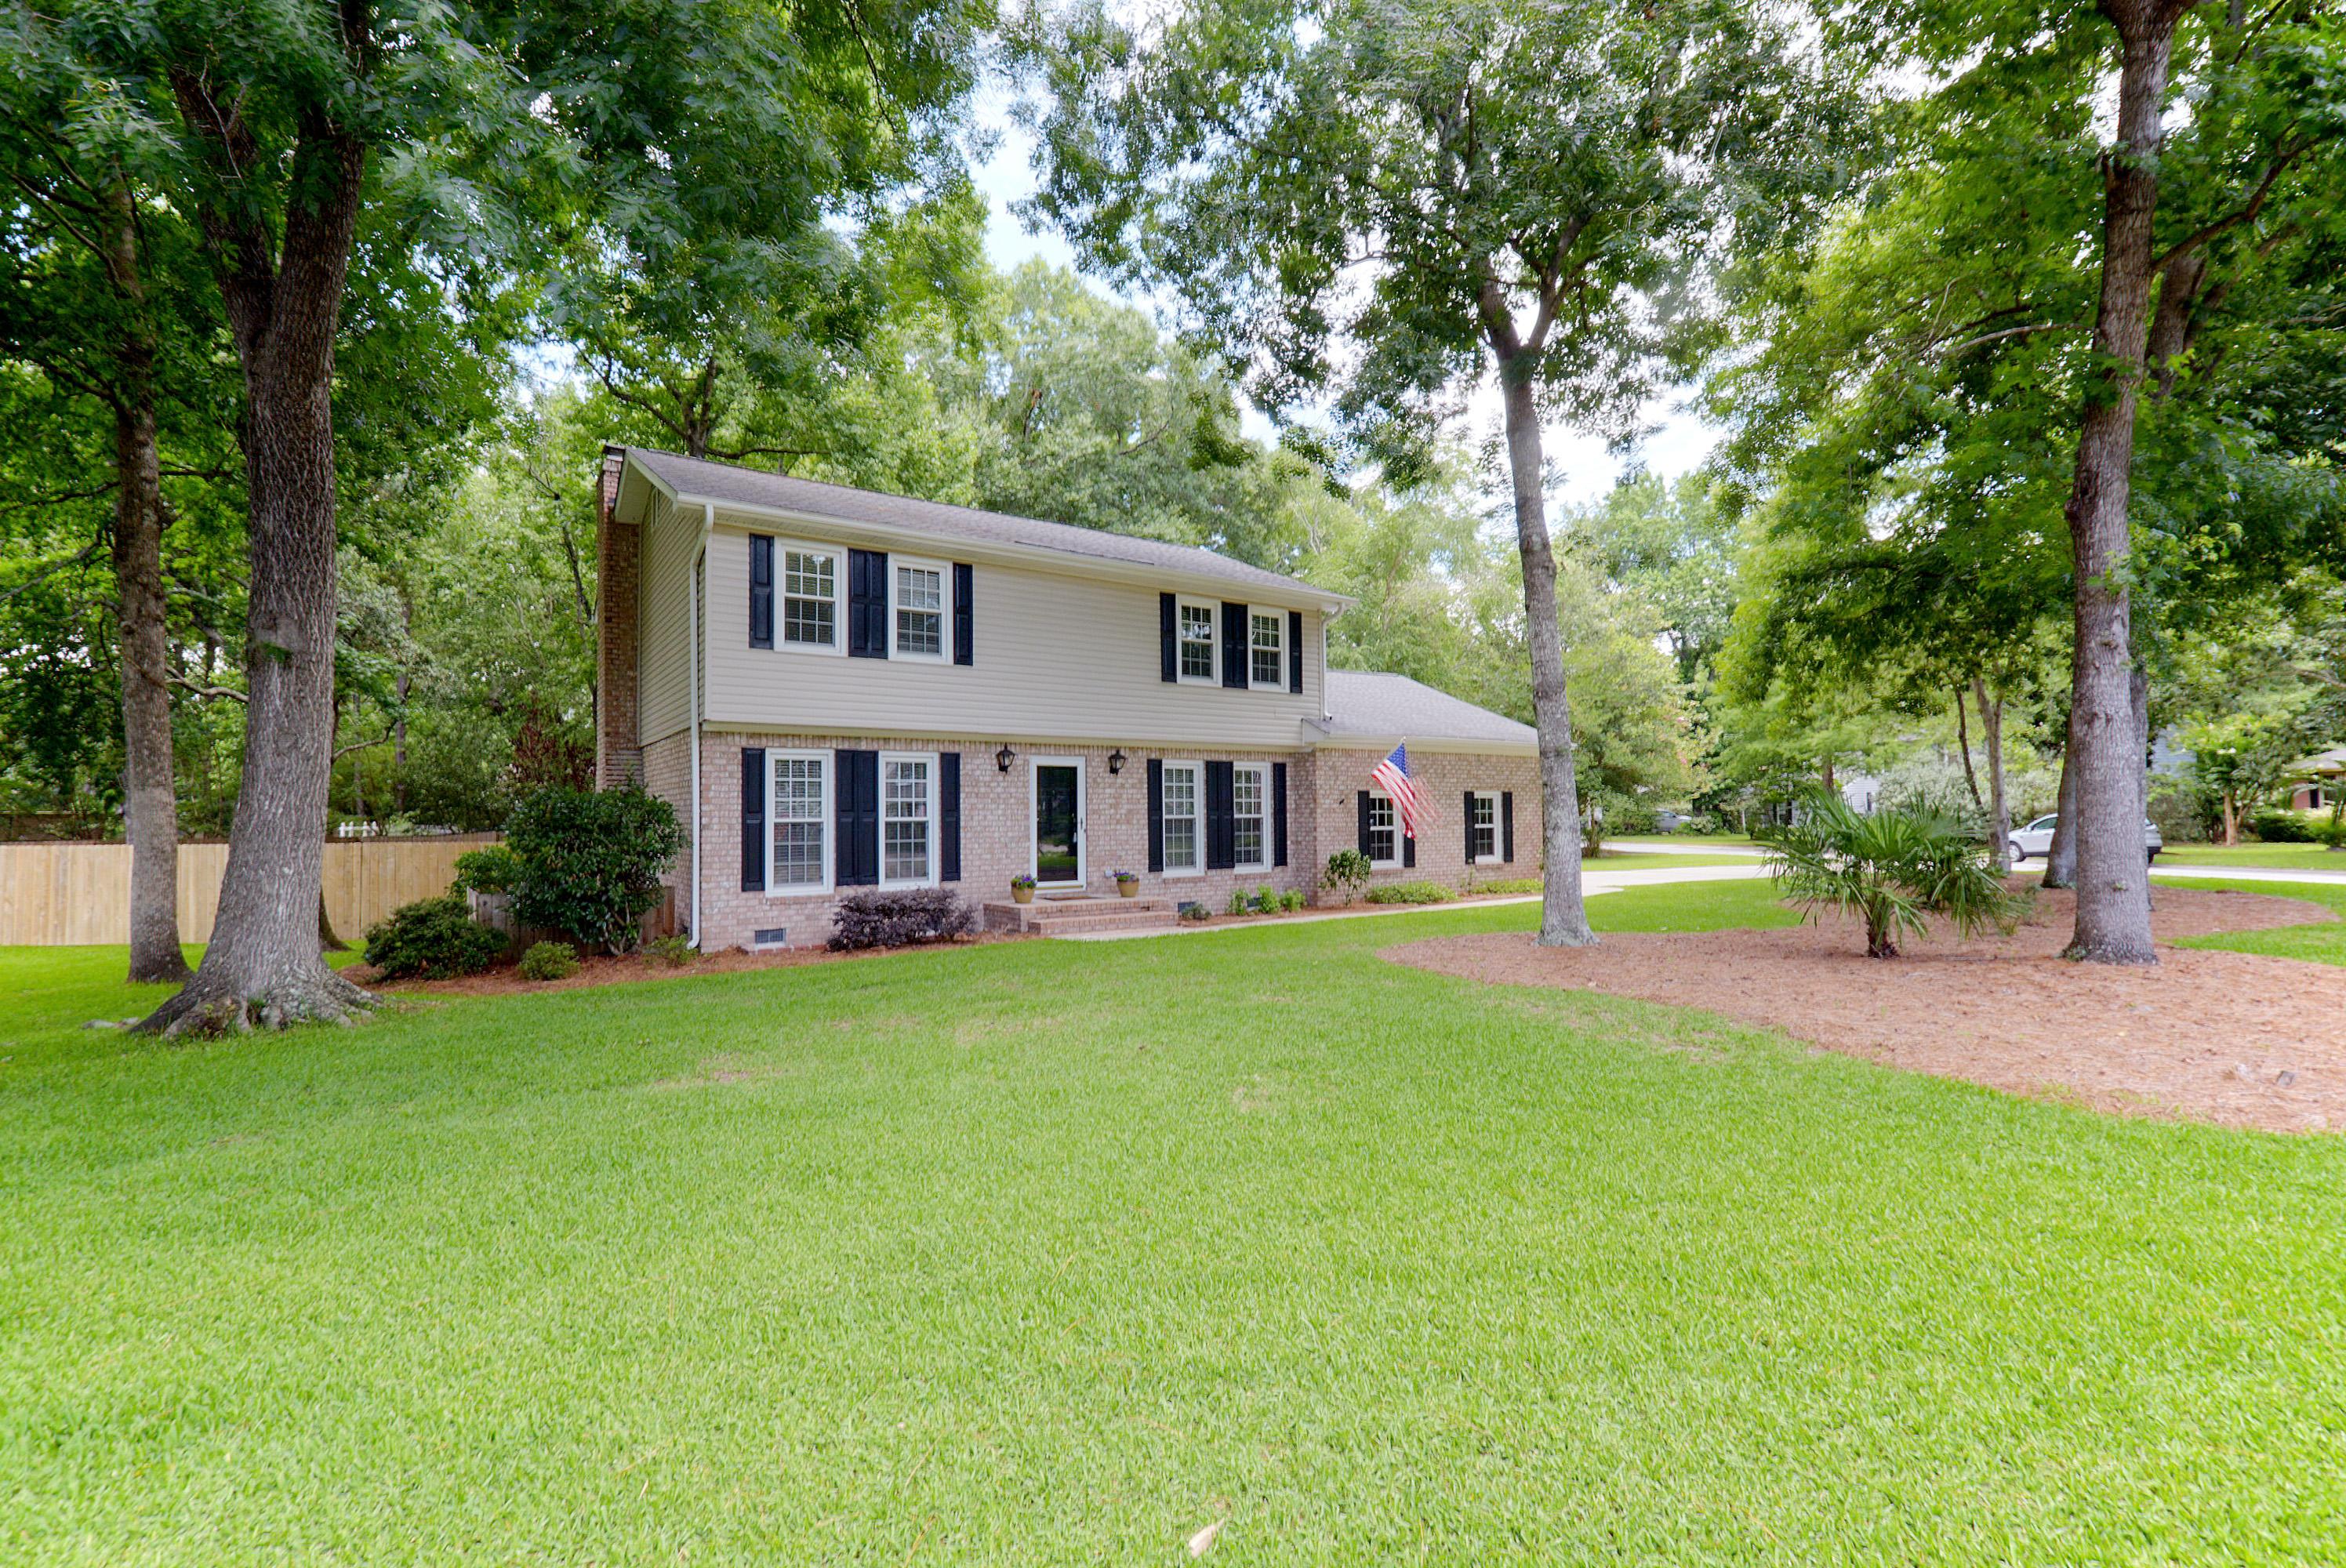 Snee Farm Homes For Sale - 1048 Royalist Rd, Mount Pleasant, SC - 3